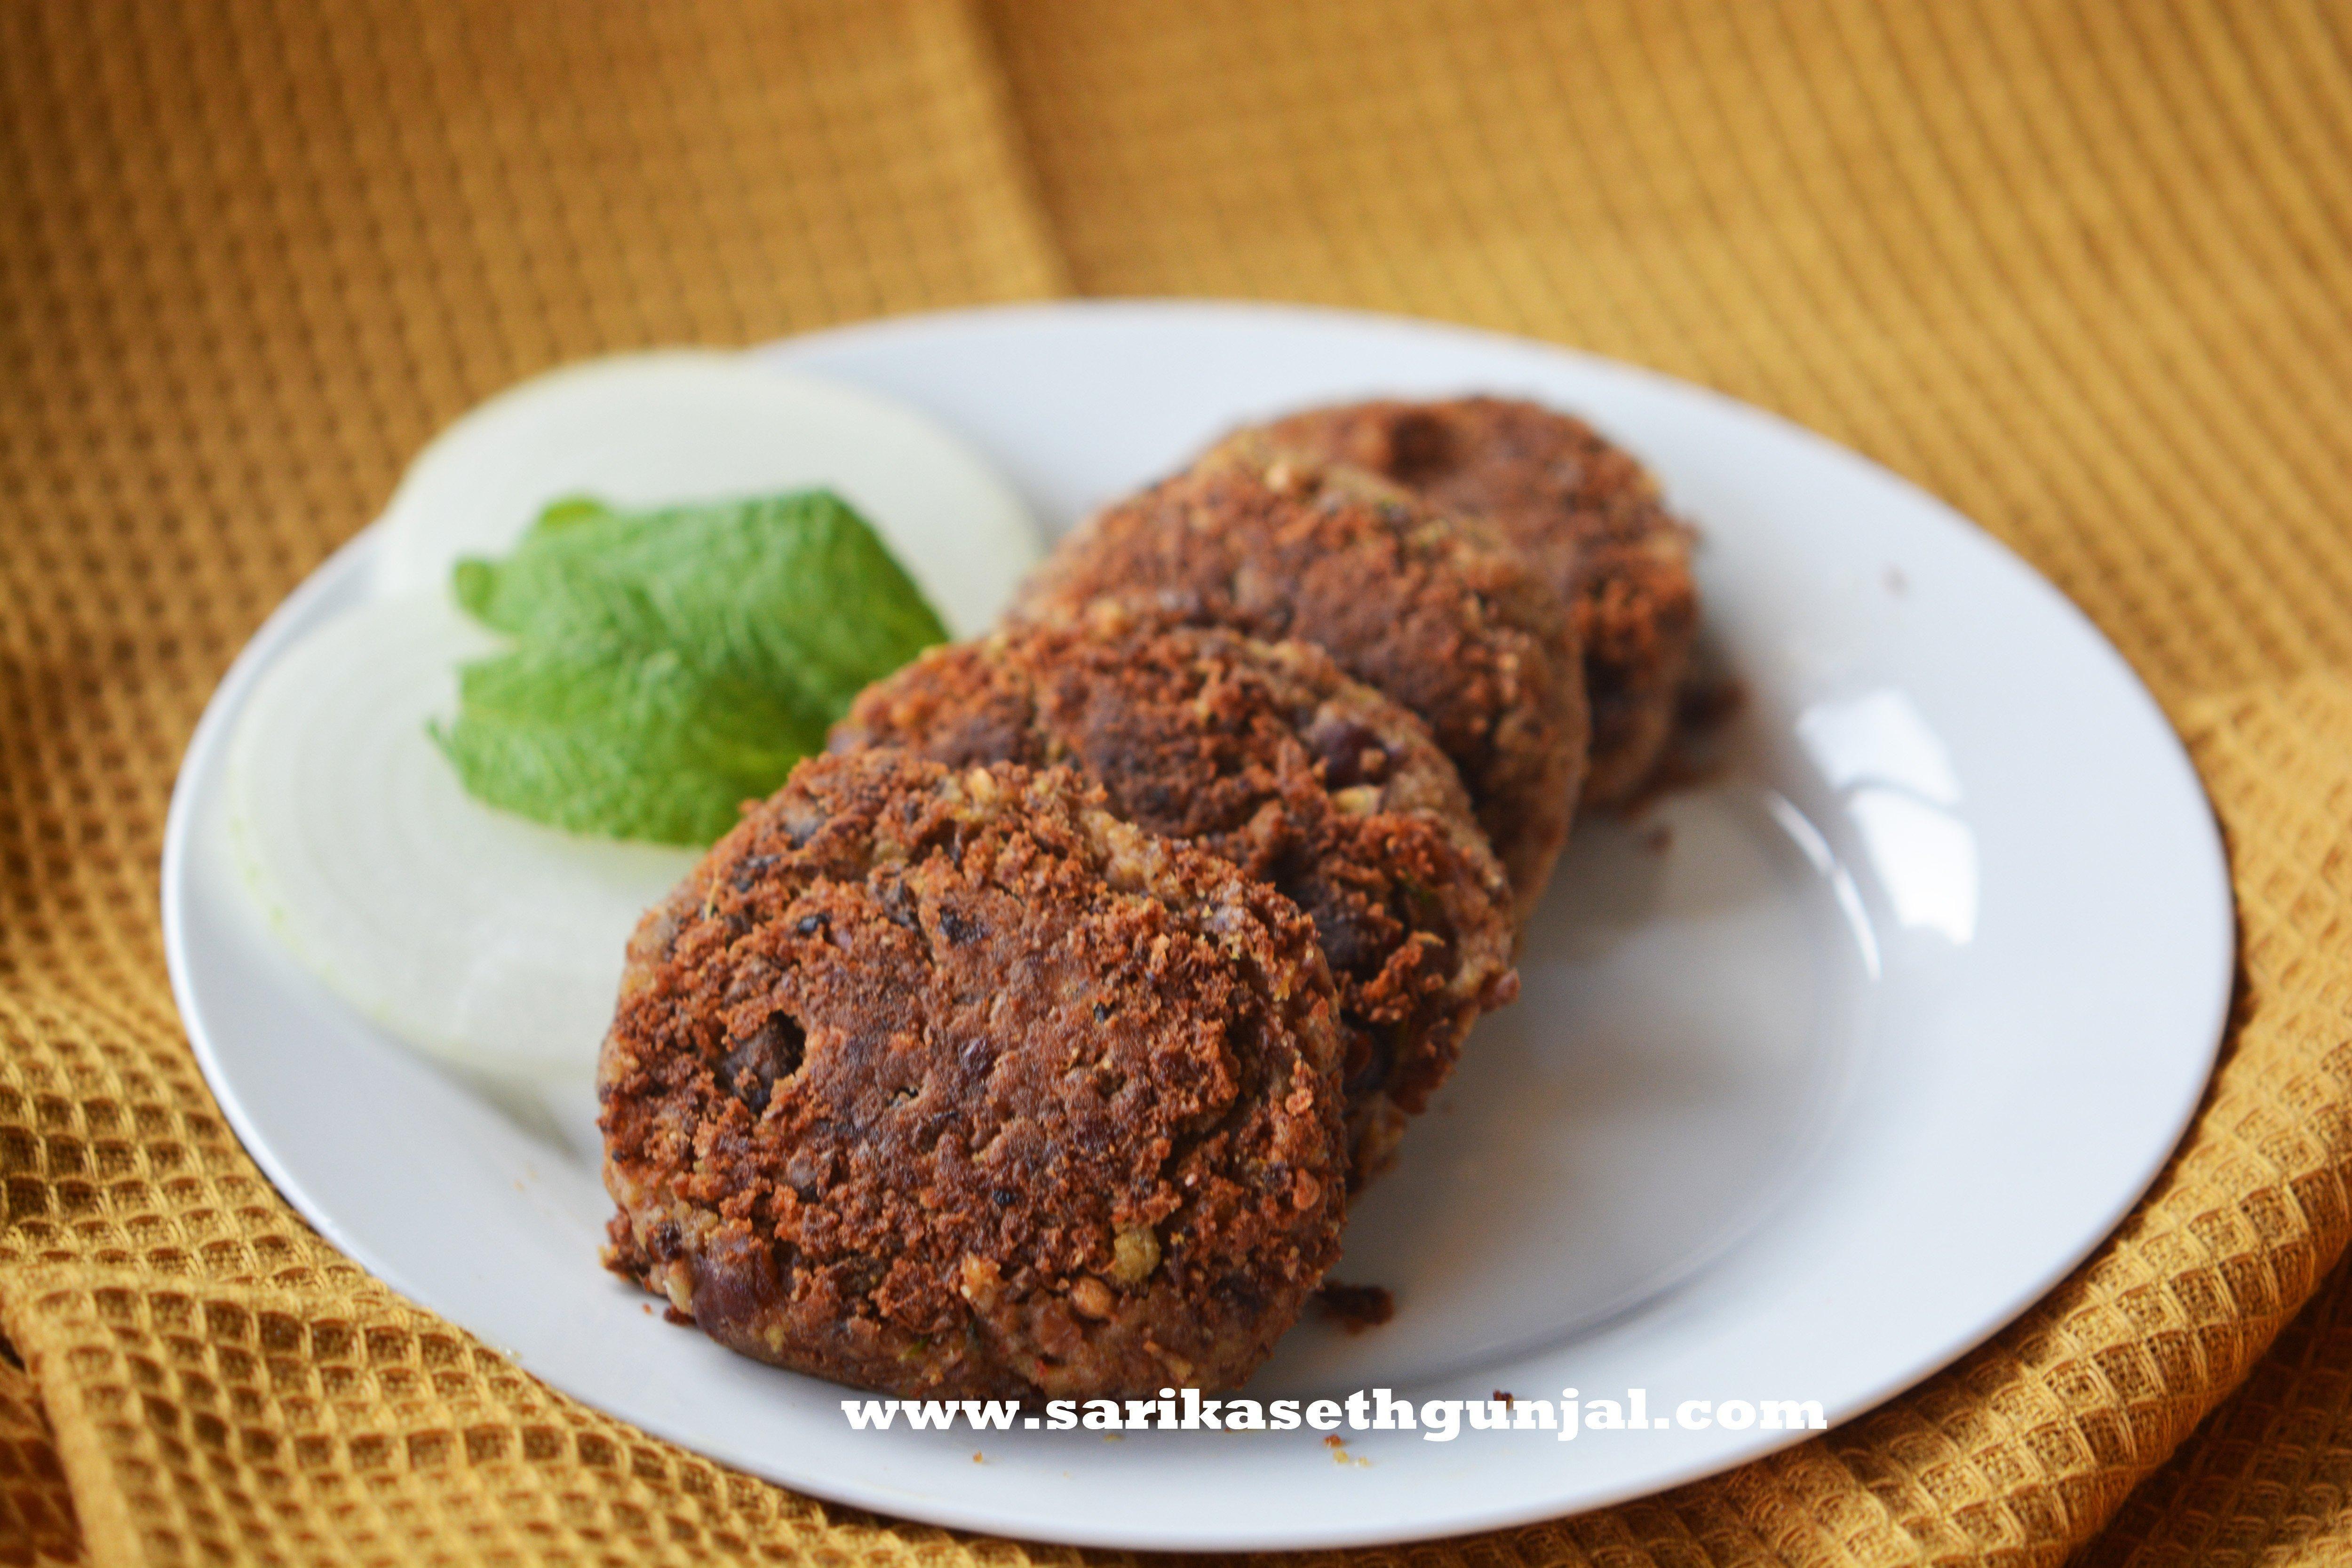 Indian Sandwich Recipes For Diabetics